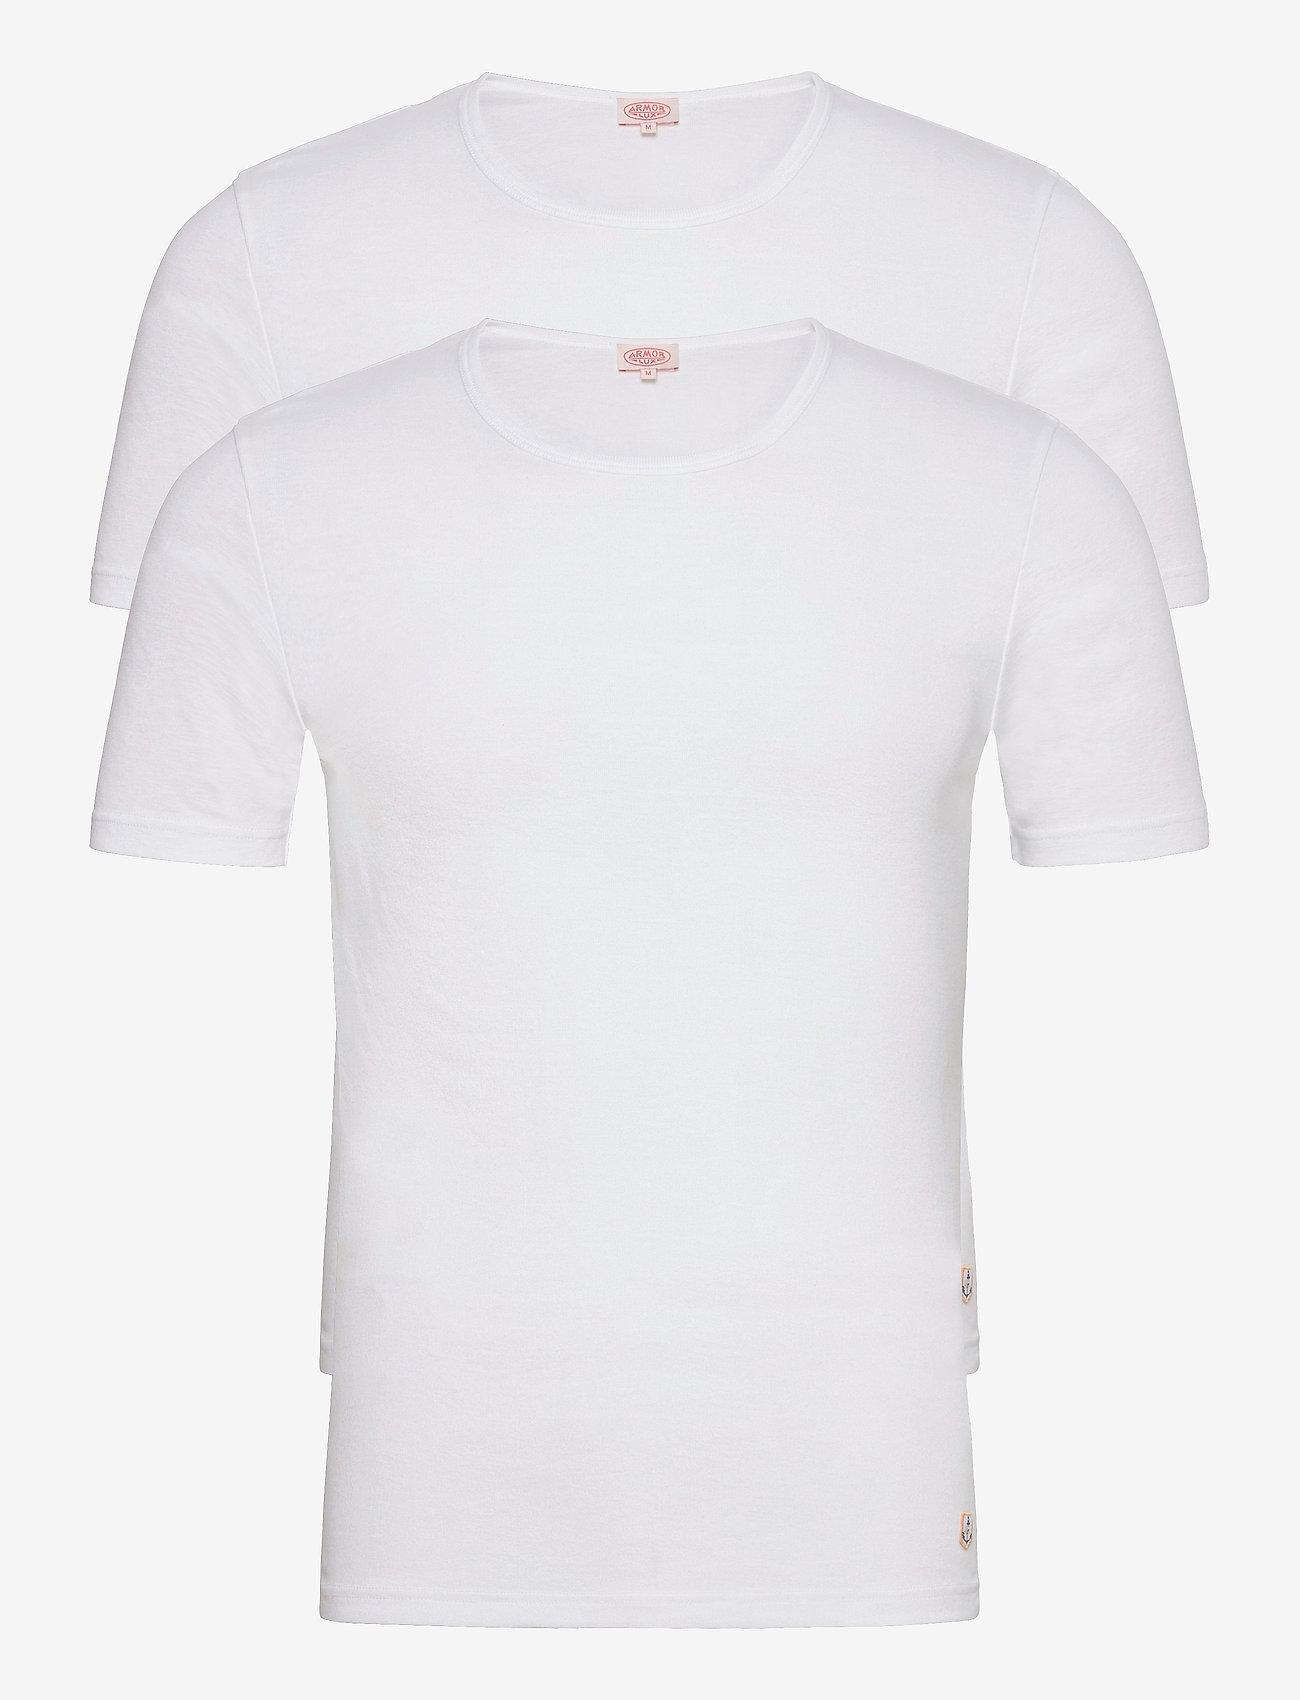 Armor Lux - 2 Pack T-Shirt - multipack - white/white - 0